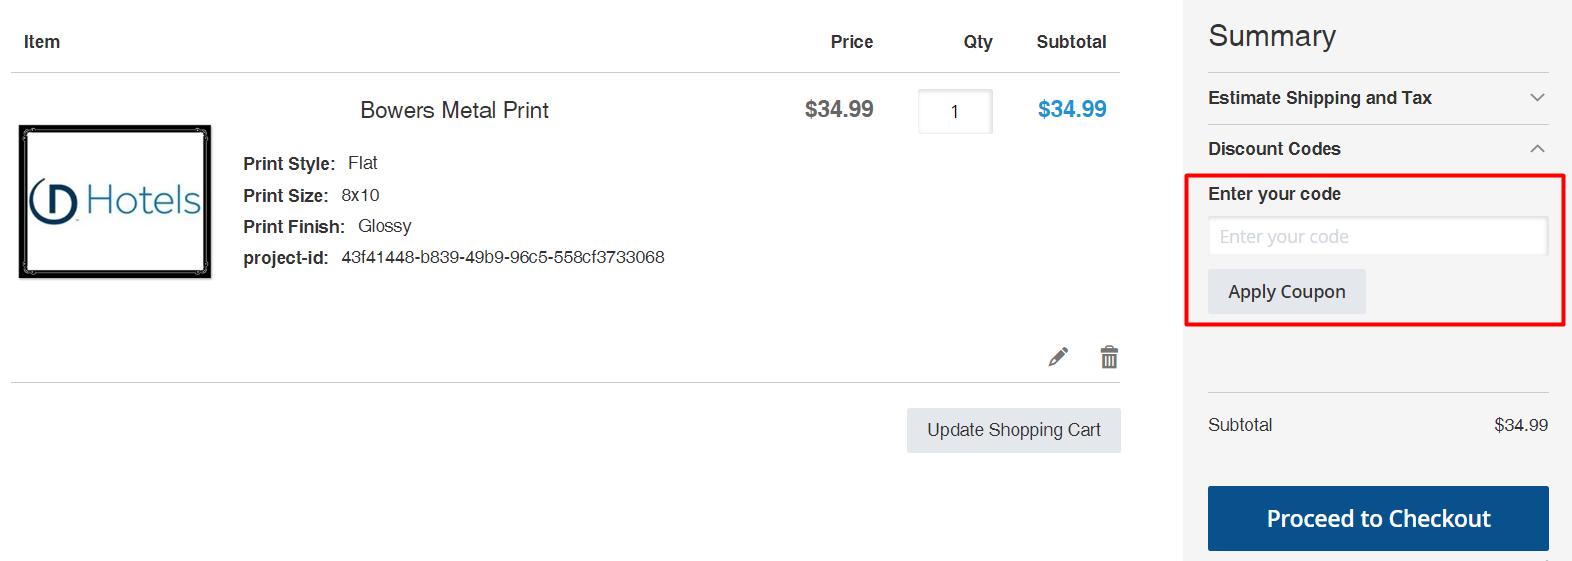 How do I use my EZ Prints discount code?